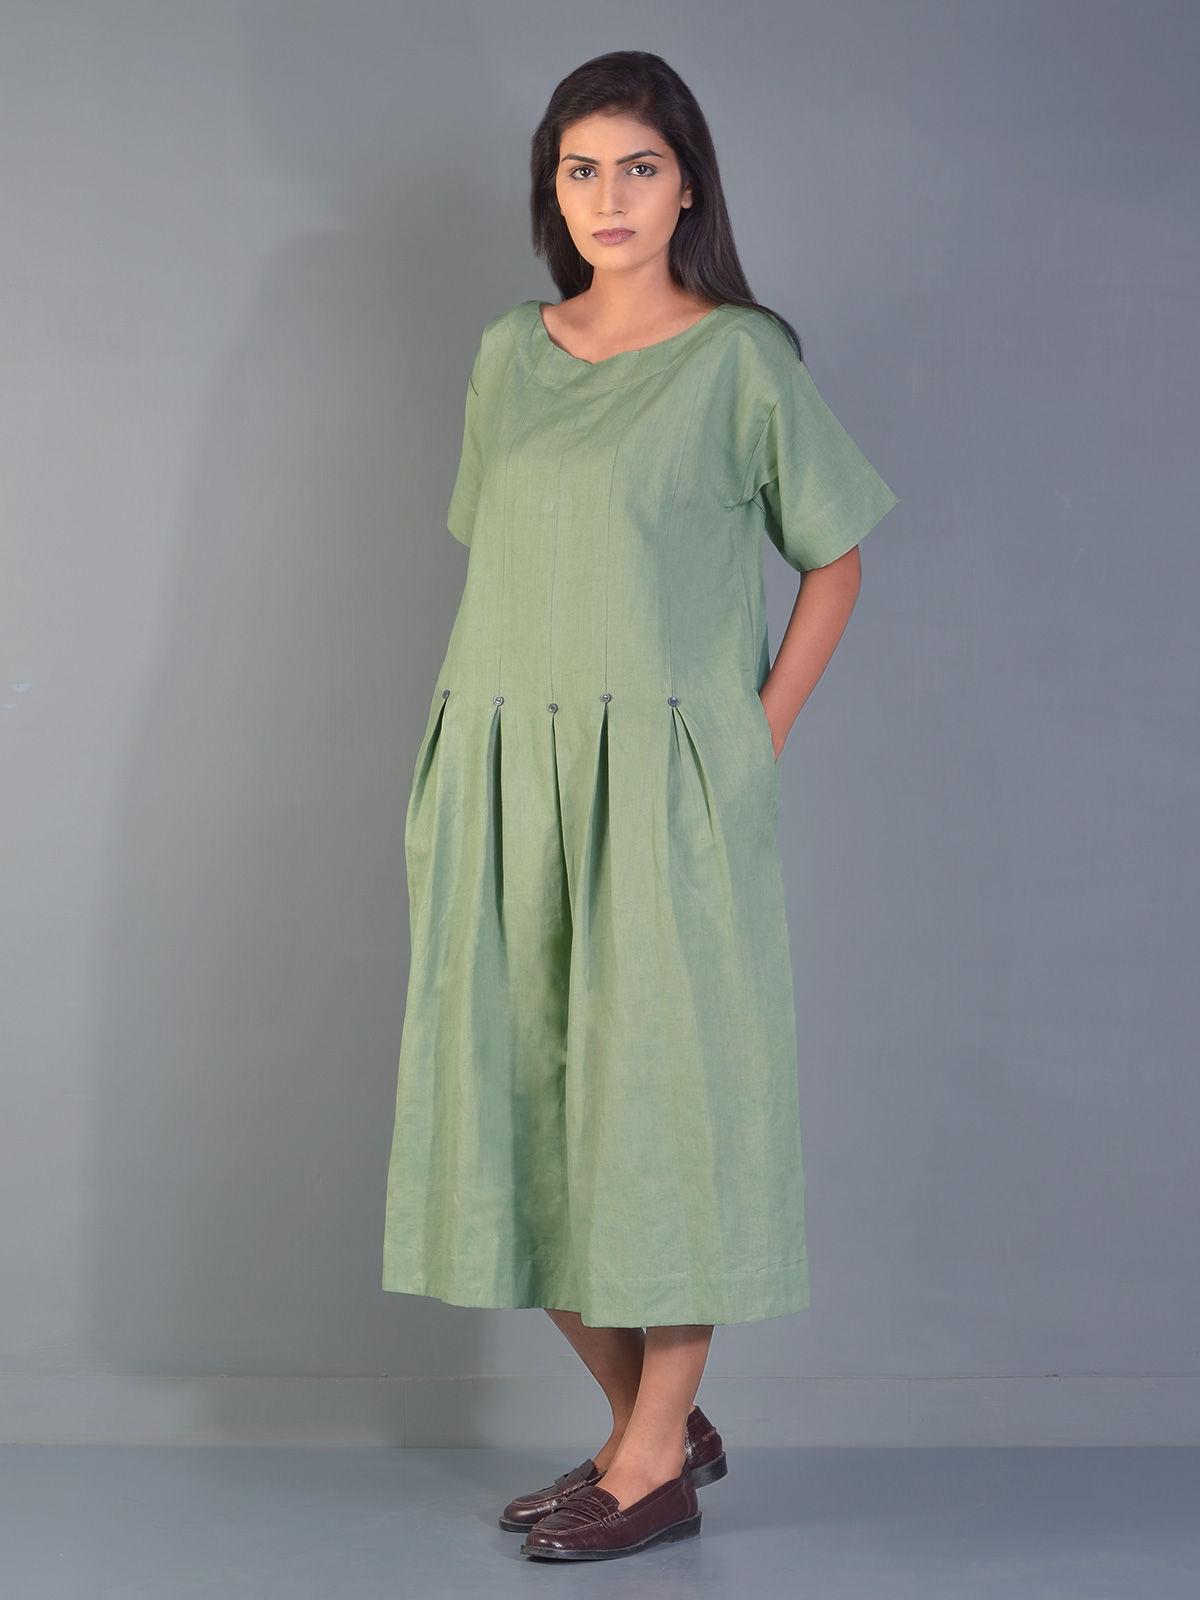 Olive Green Umbrella Linen Tunic